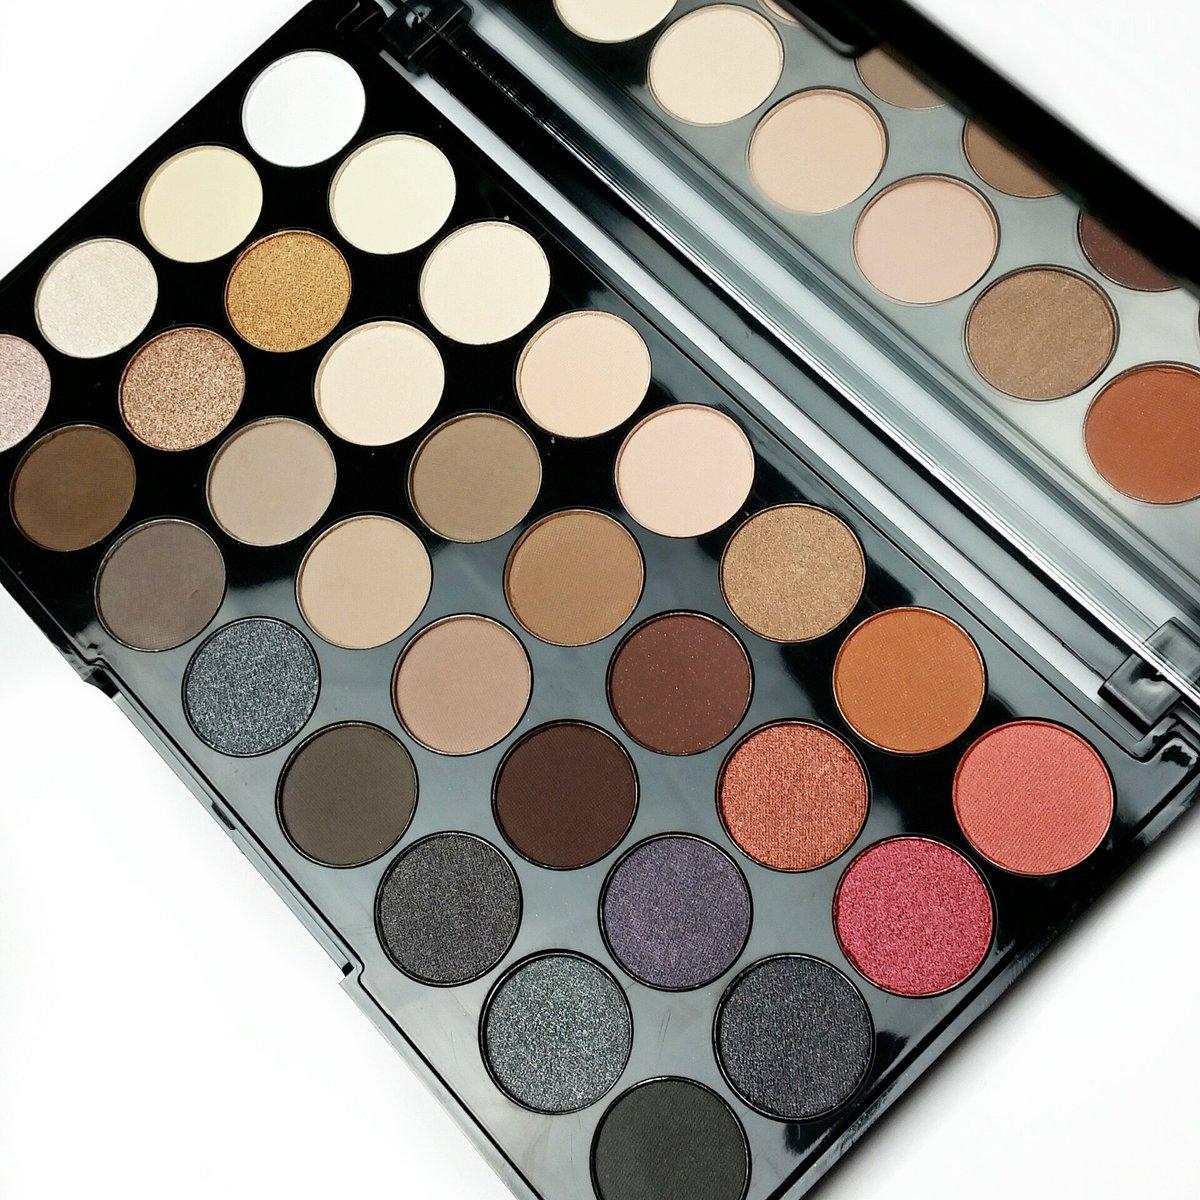 makeup revolution flawless 2 ultra 32 eyeshadow palette. Black Bedroom Furniture Sets. Home Design Ideas